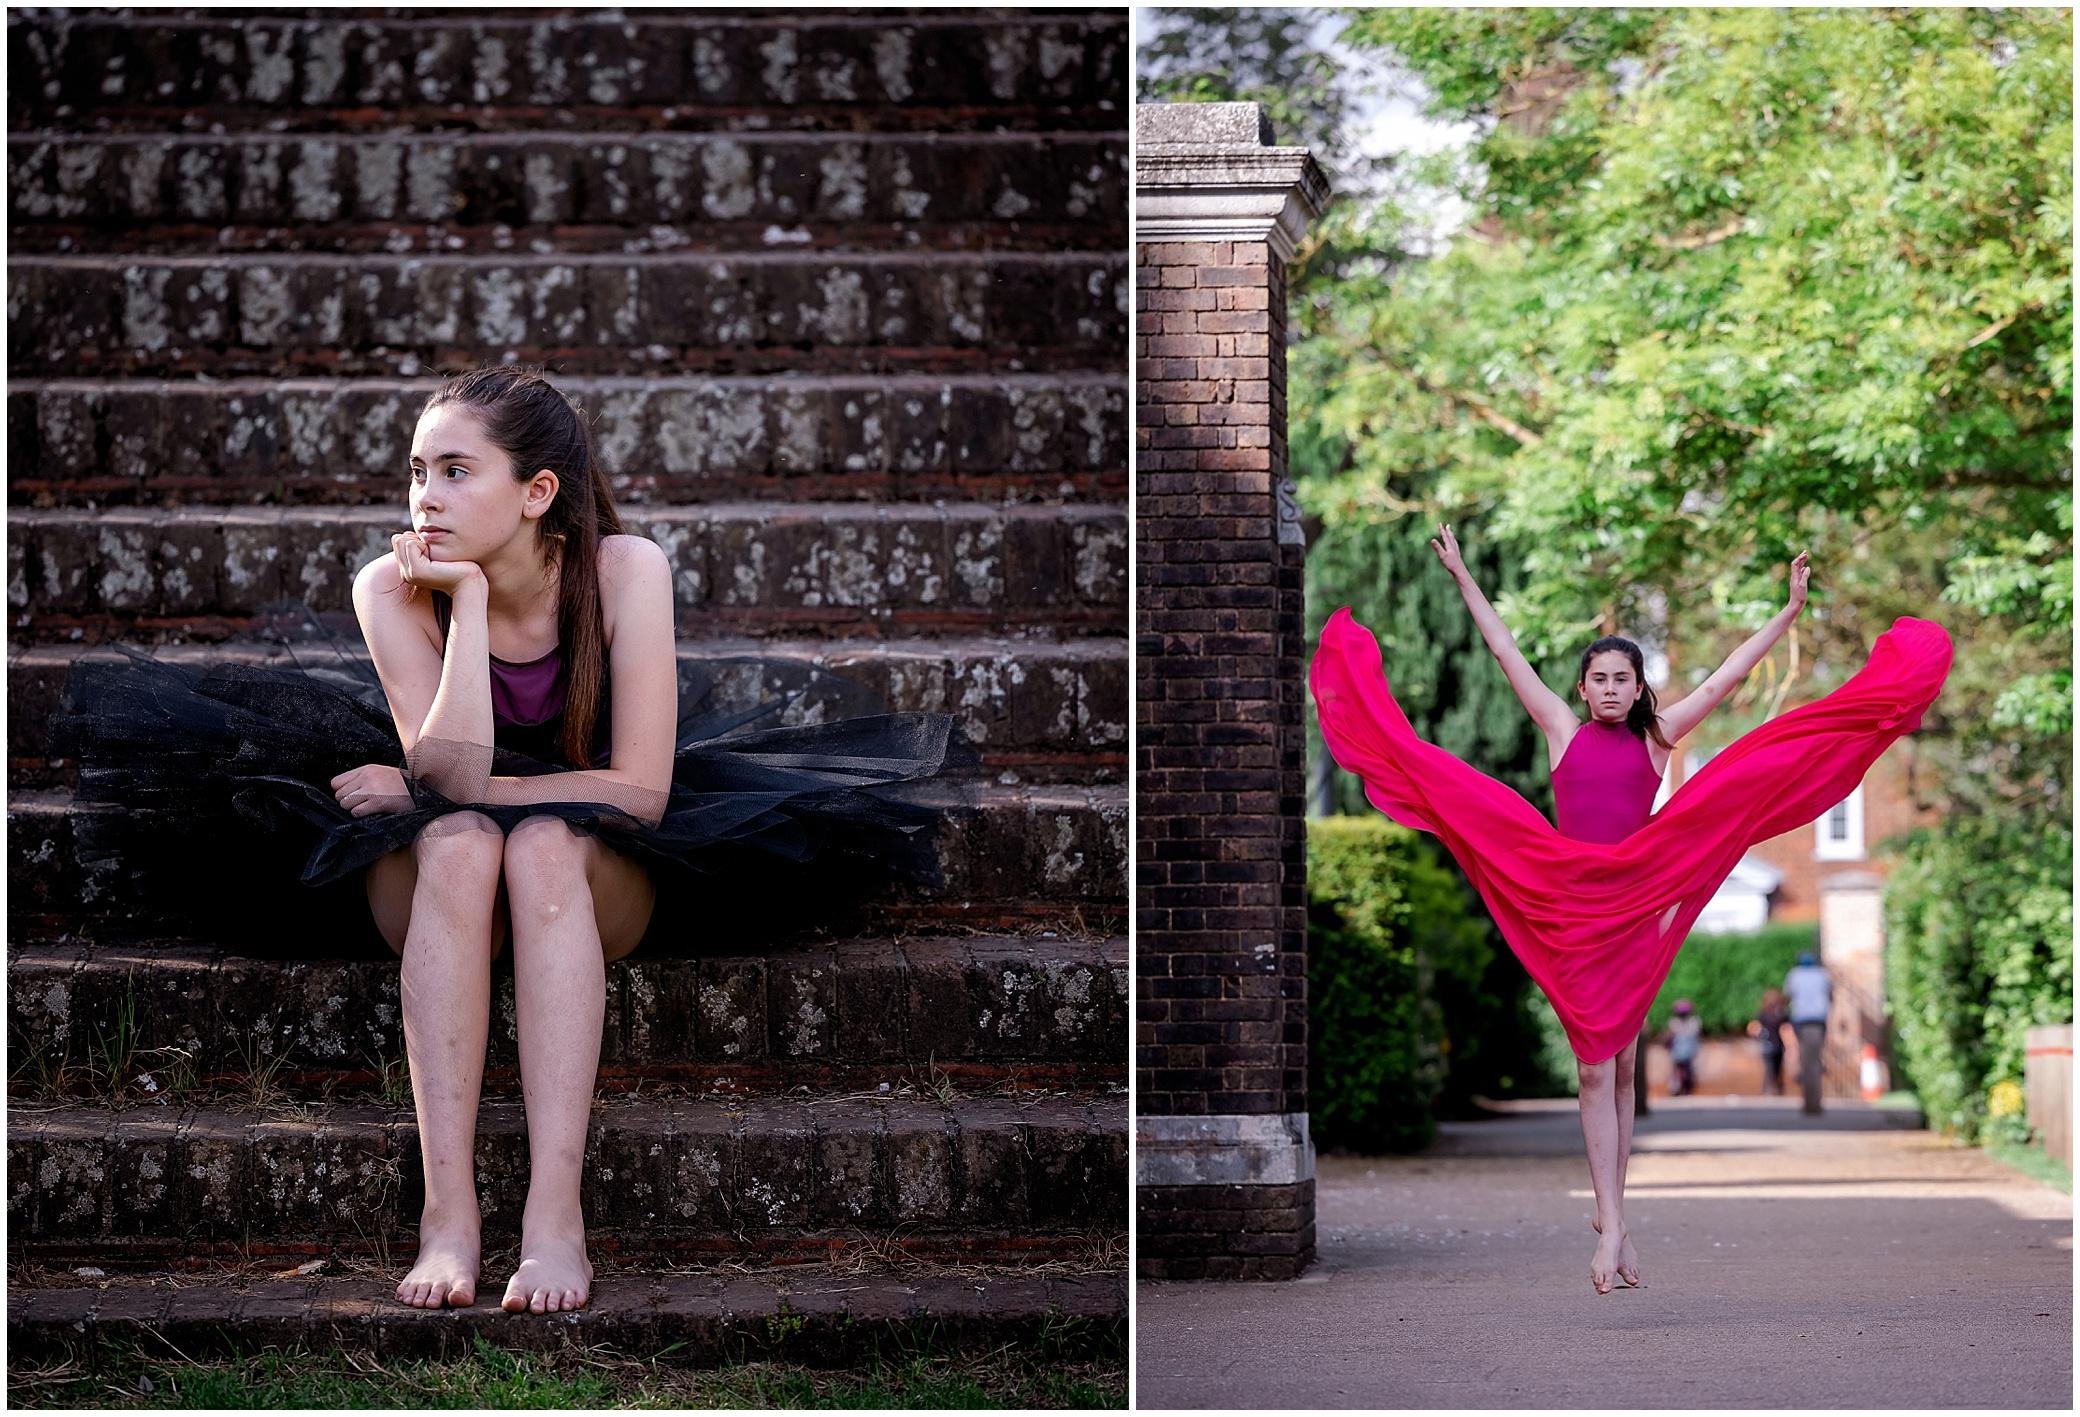 dance students posing in London